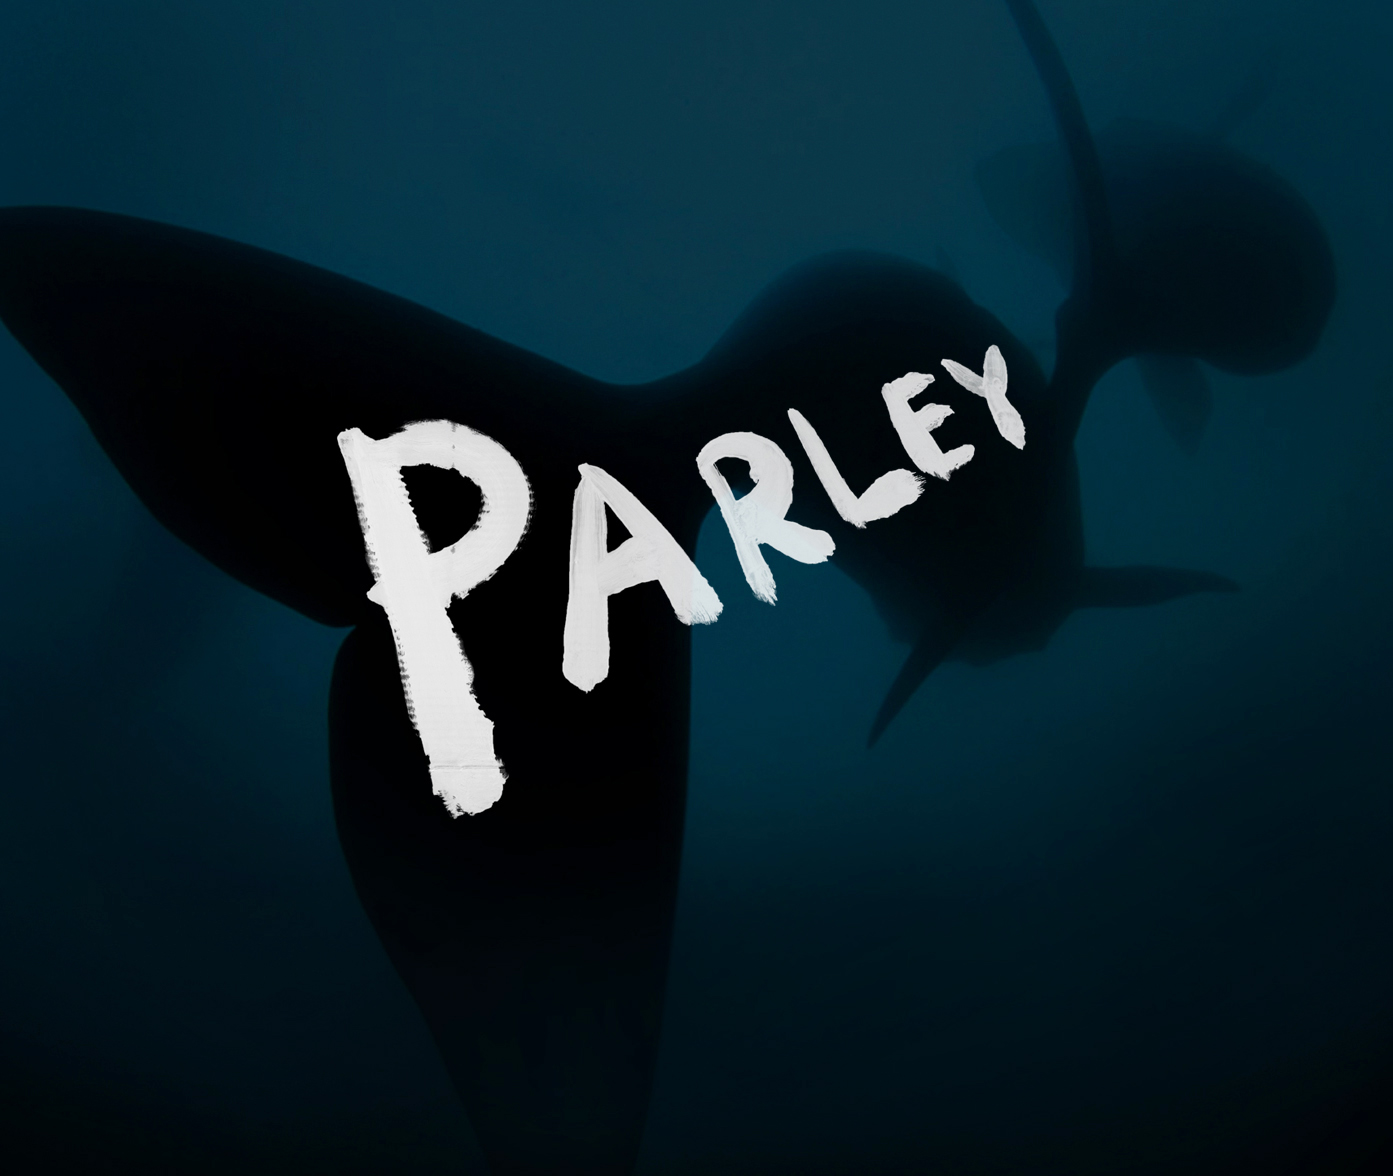 Parley biocorpaavc Gallery